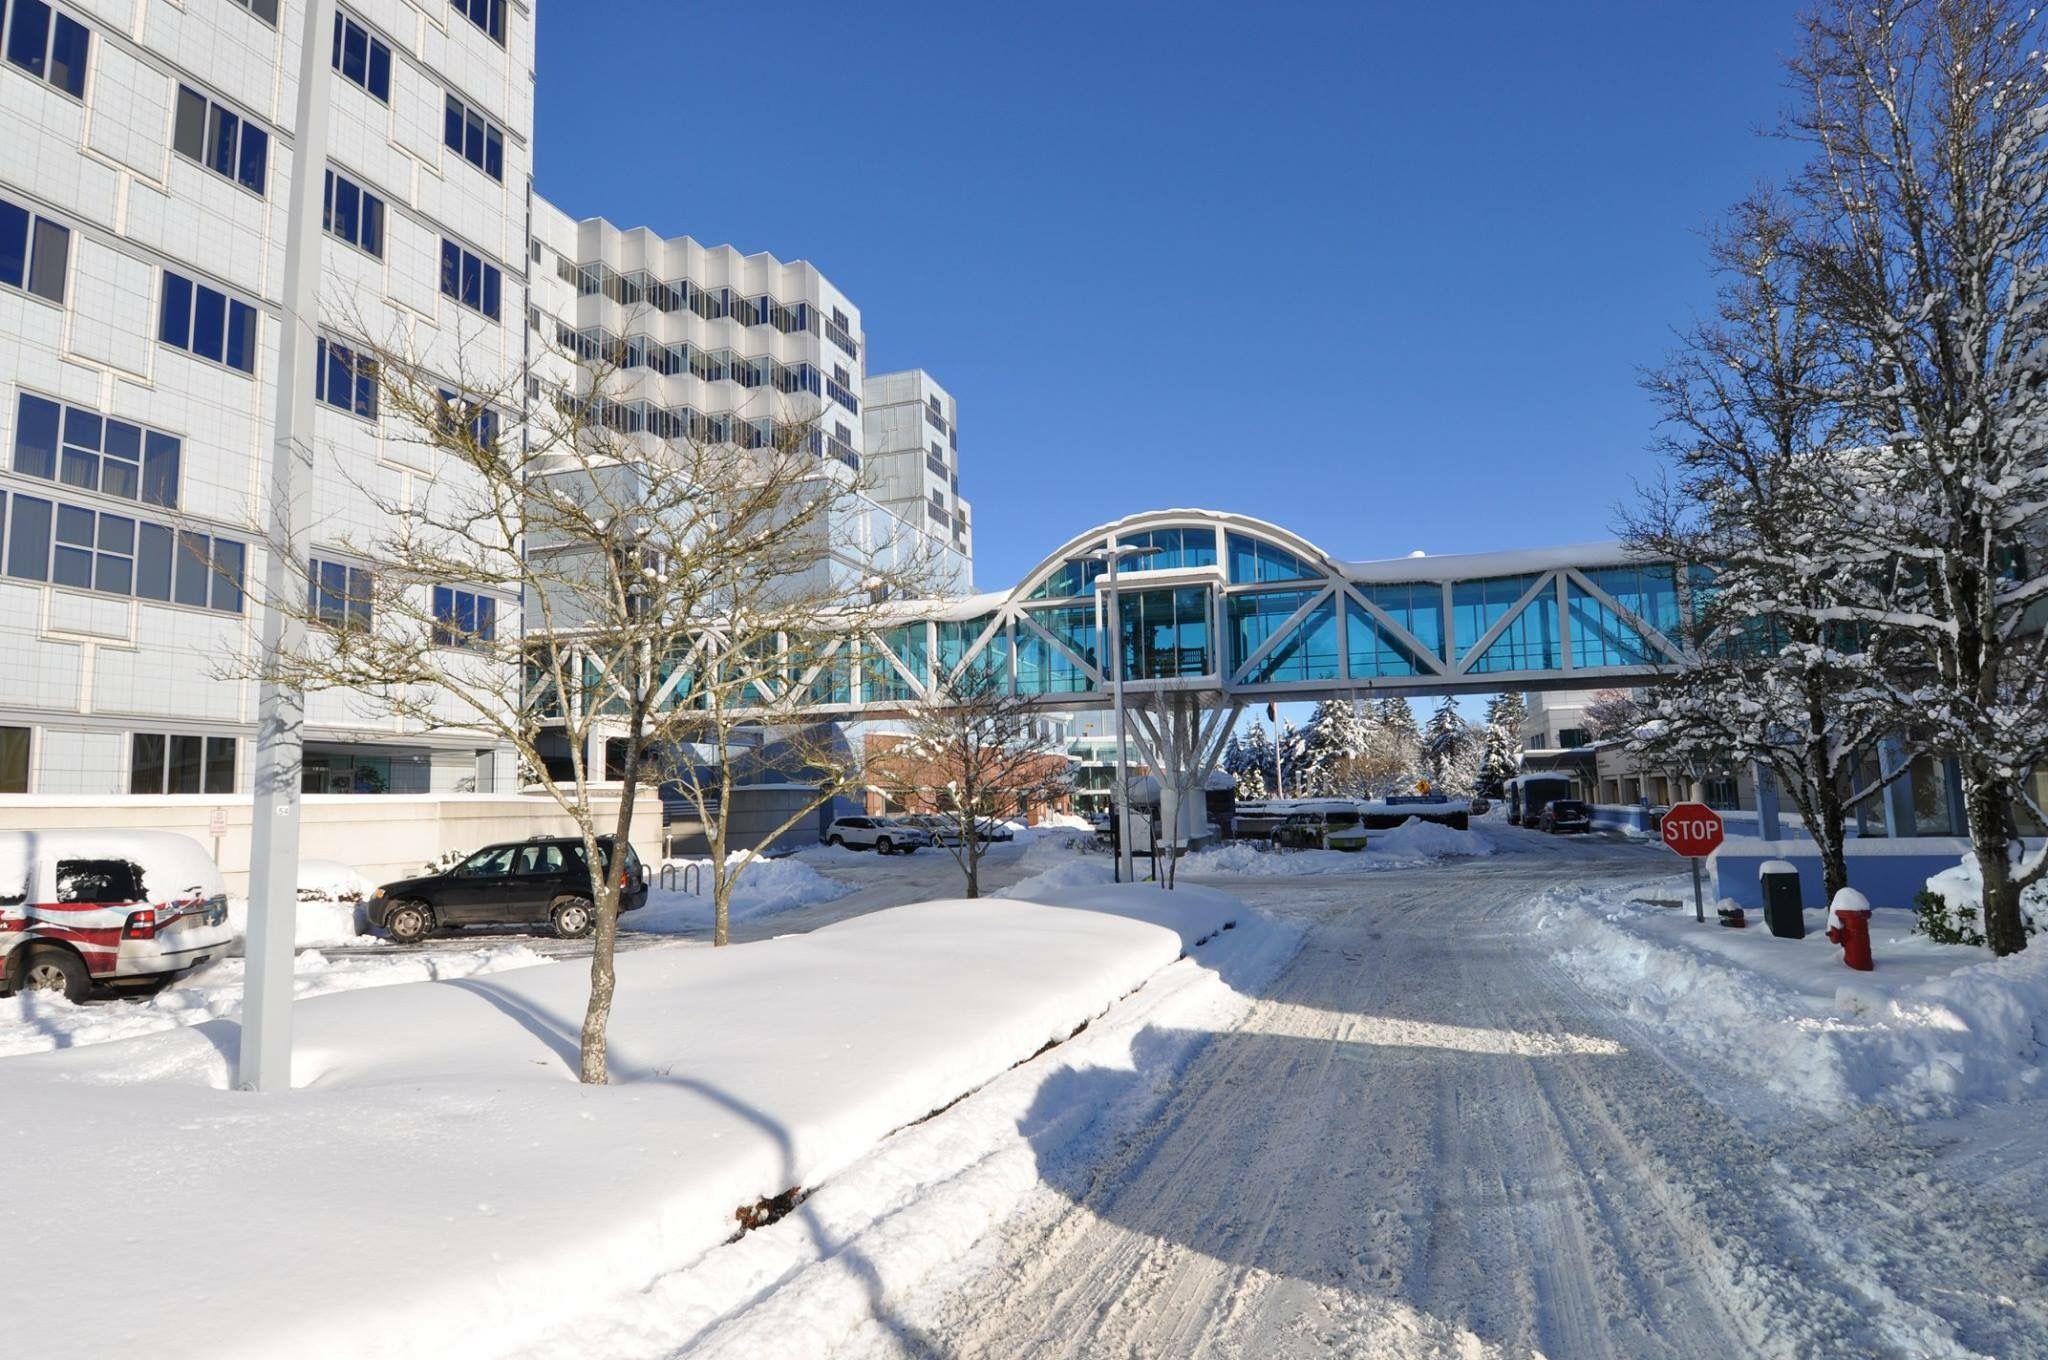 Portland VA Medical Center winter 2017 Oregon, Street